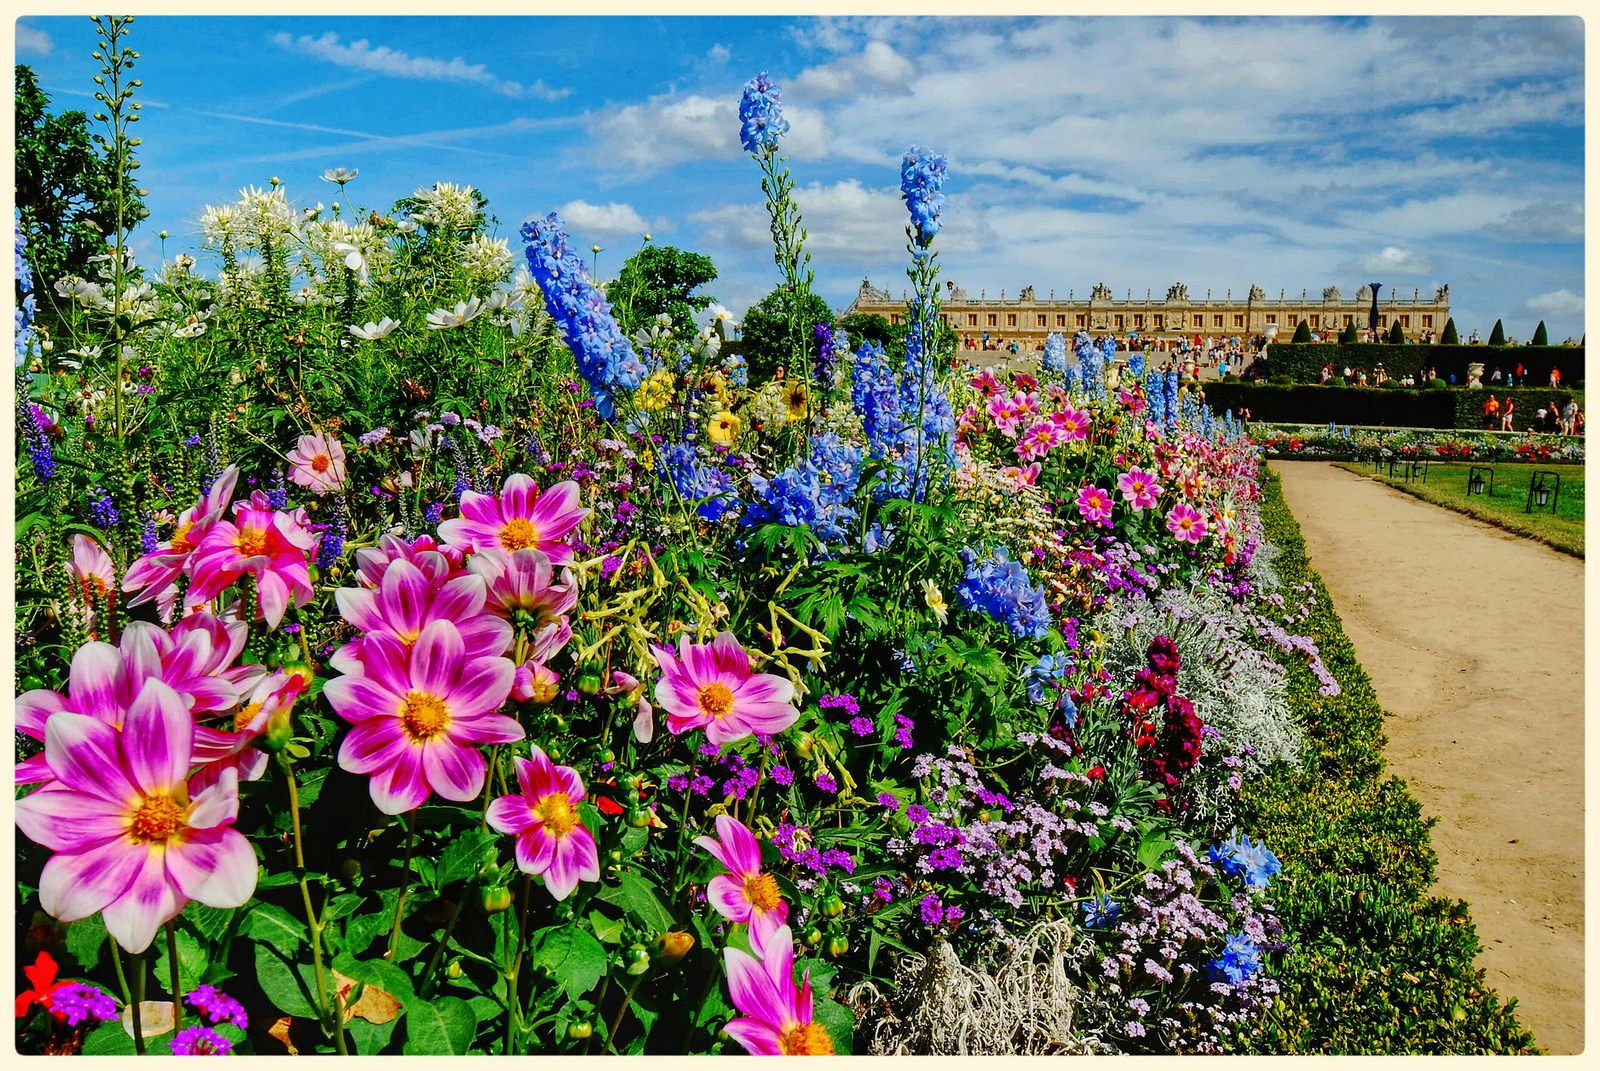 Les jardins de Versailles, Mai 2015 | Flickr - Photo Sharing!